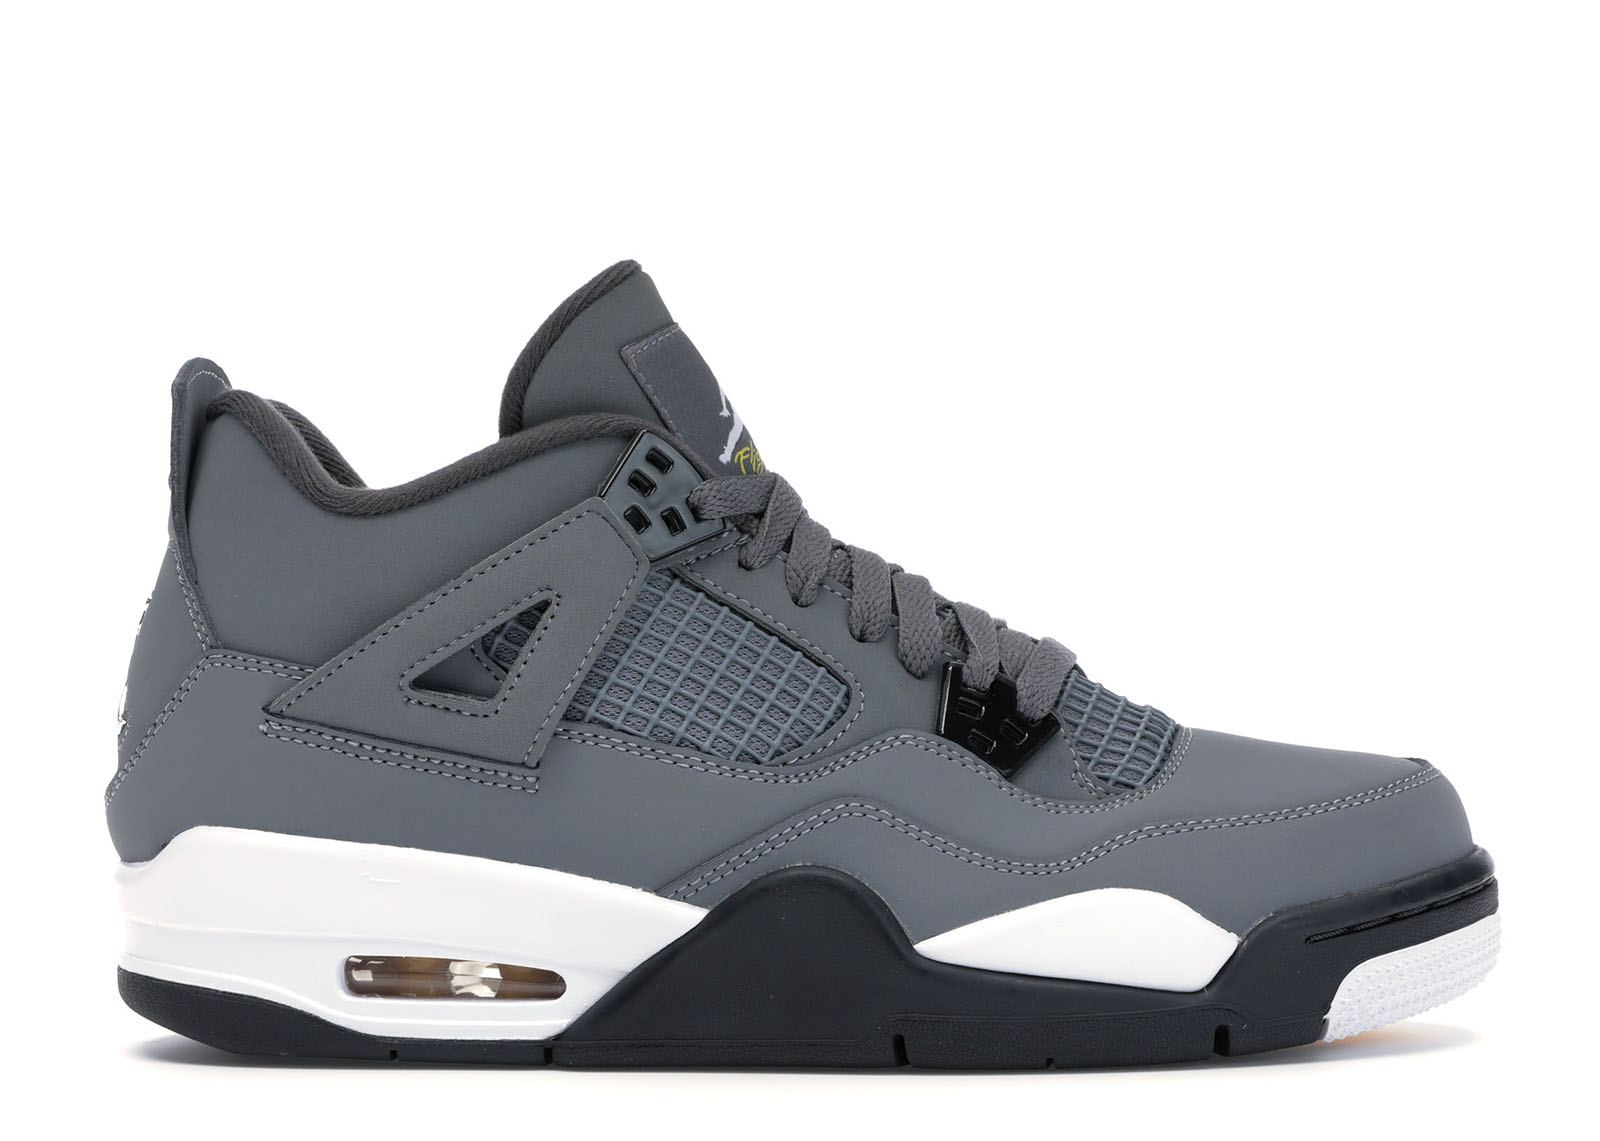 Jordan 4 Retro Cool Grey 2019 (GS